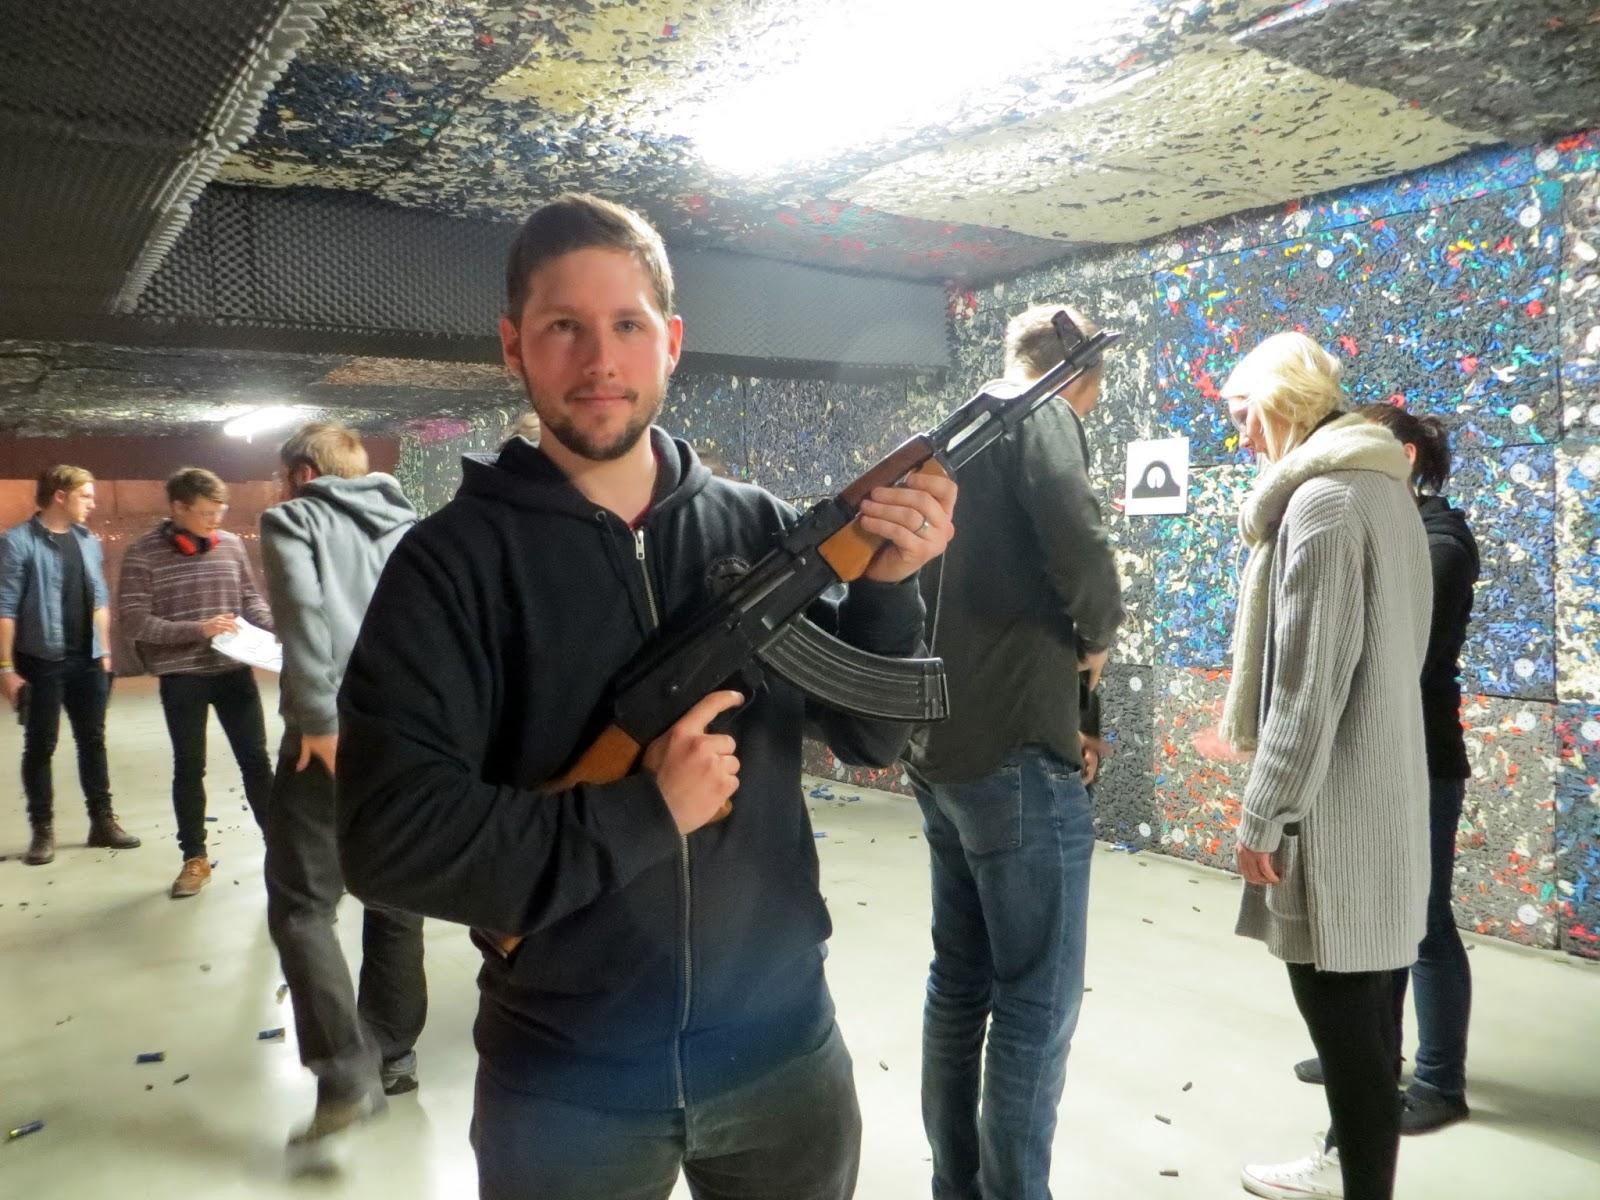 AK47, Shooting range, pistol, Ruger Mk III, GLOCK 17, Revolvers, Ceska Zbrojovka, Grand Taurus 86, Rifles, Kalashnikov (AK-47), Remington 870, Shotgun, Weapons, Dragunov, (SVD), Sniper Rifle, celeritas shooting club, eastern europe, hungary, budapest, bucket list, travel, travelling, traveling, experiences, gun, shooting, adventure, travel blog,